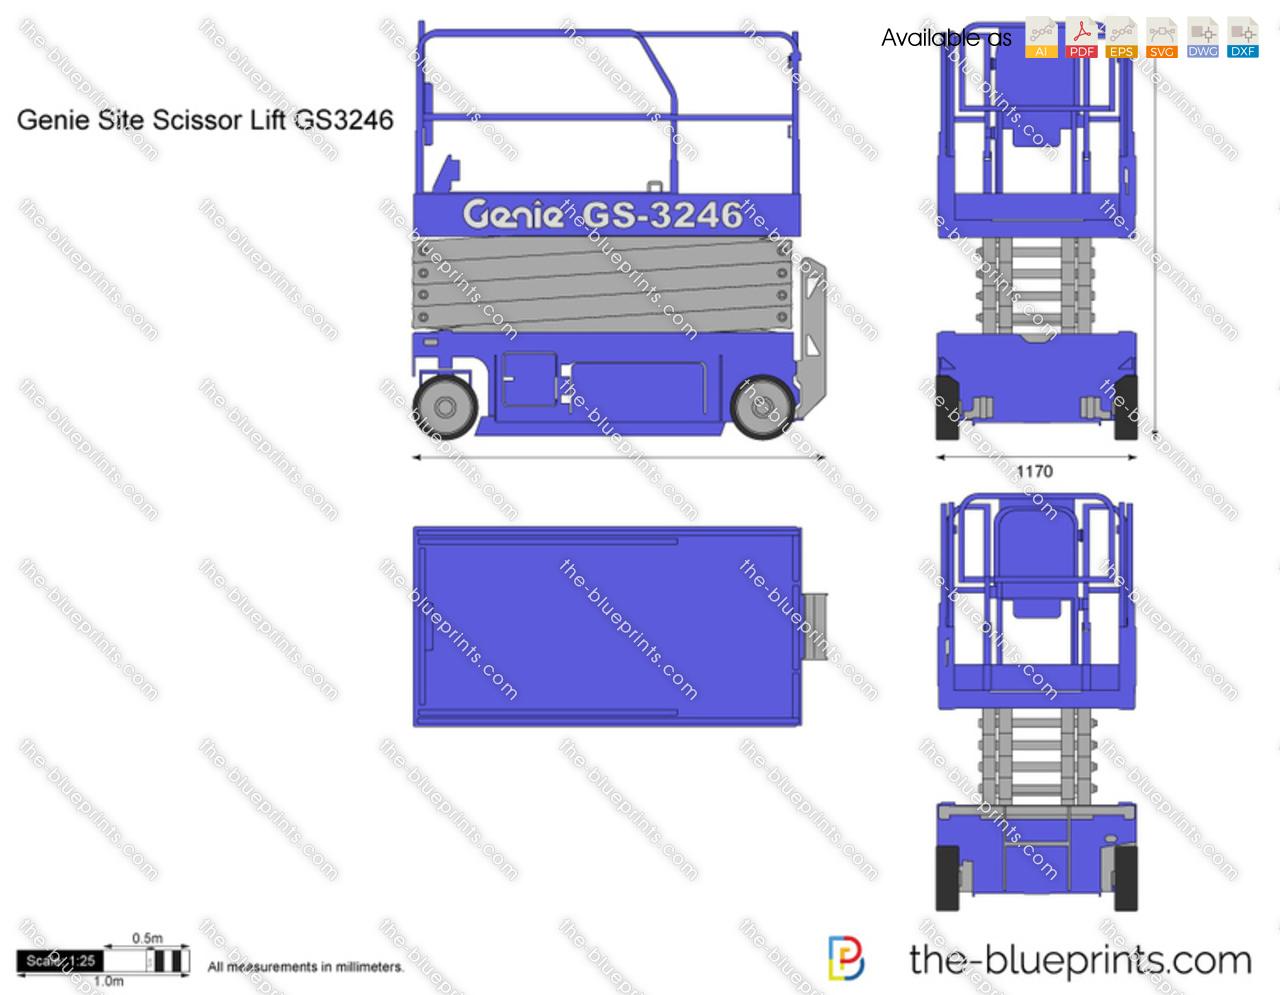 Genie Site Scissor Lift GS3246